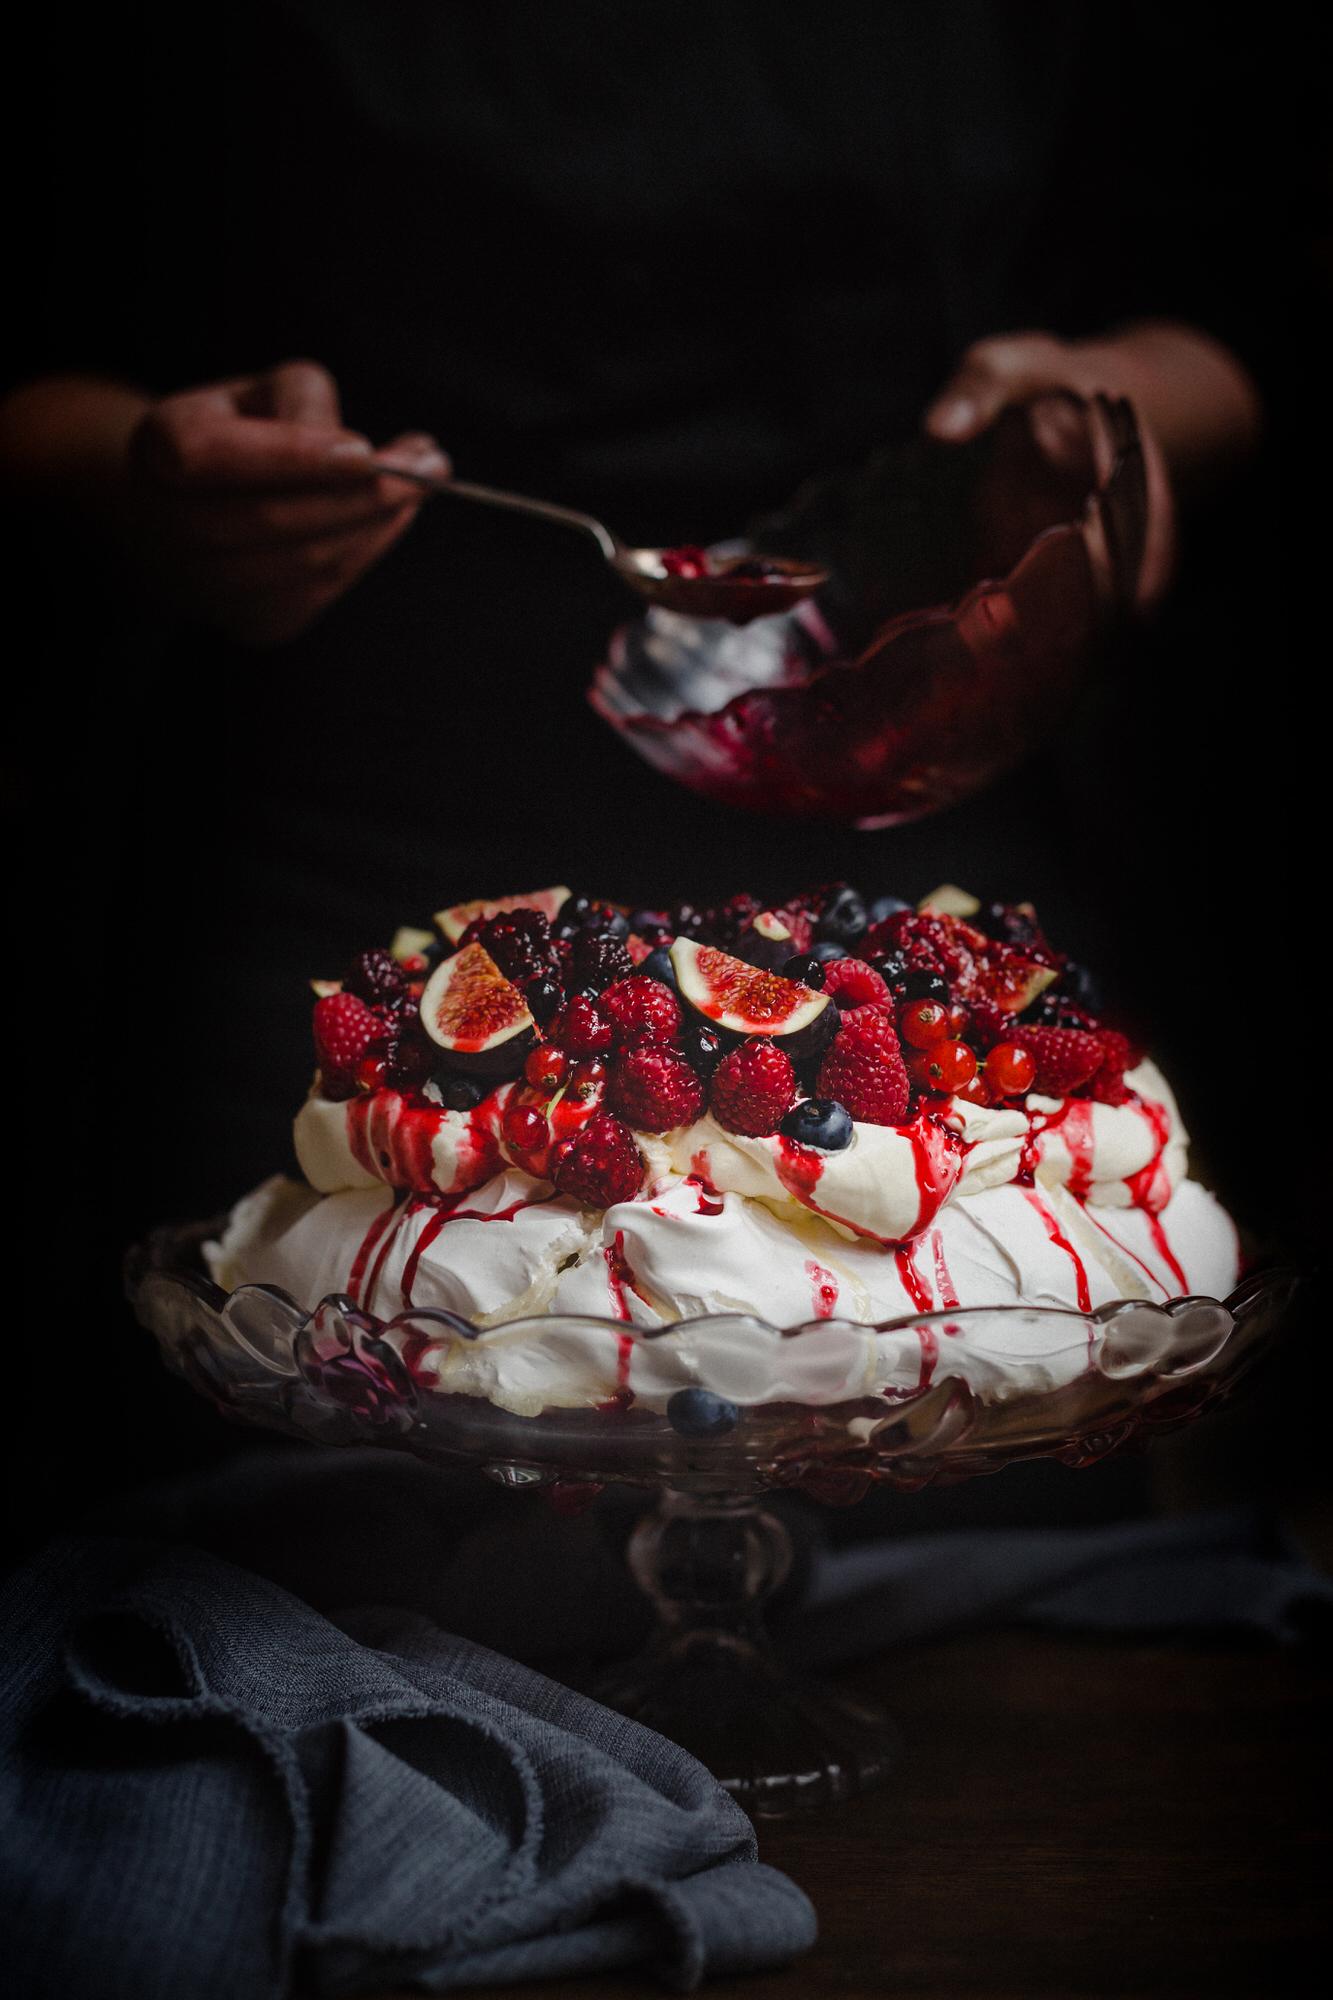 meringue-raspberry-blueberry-fruit-glasgow-catering-reagan-hallett.jpg